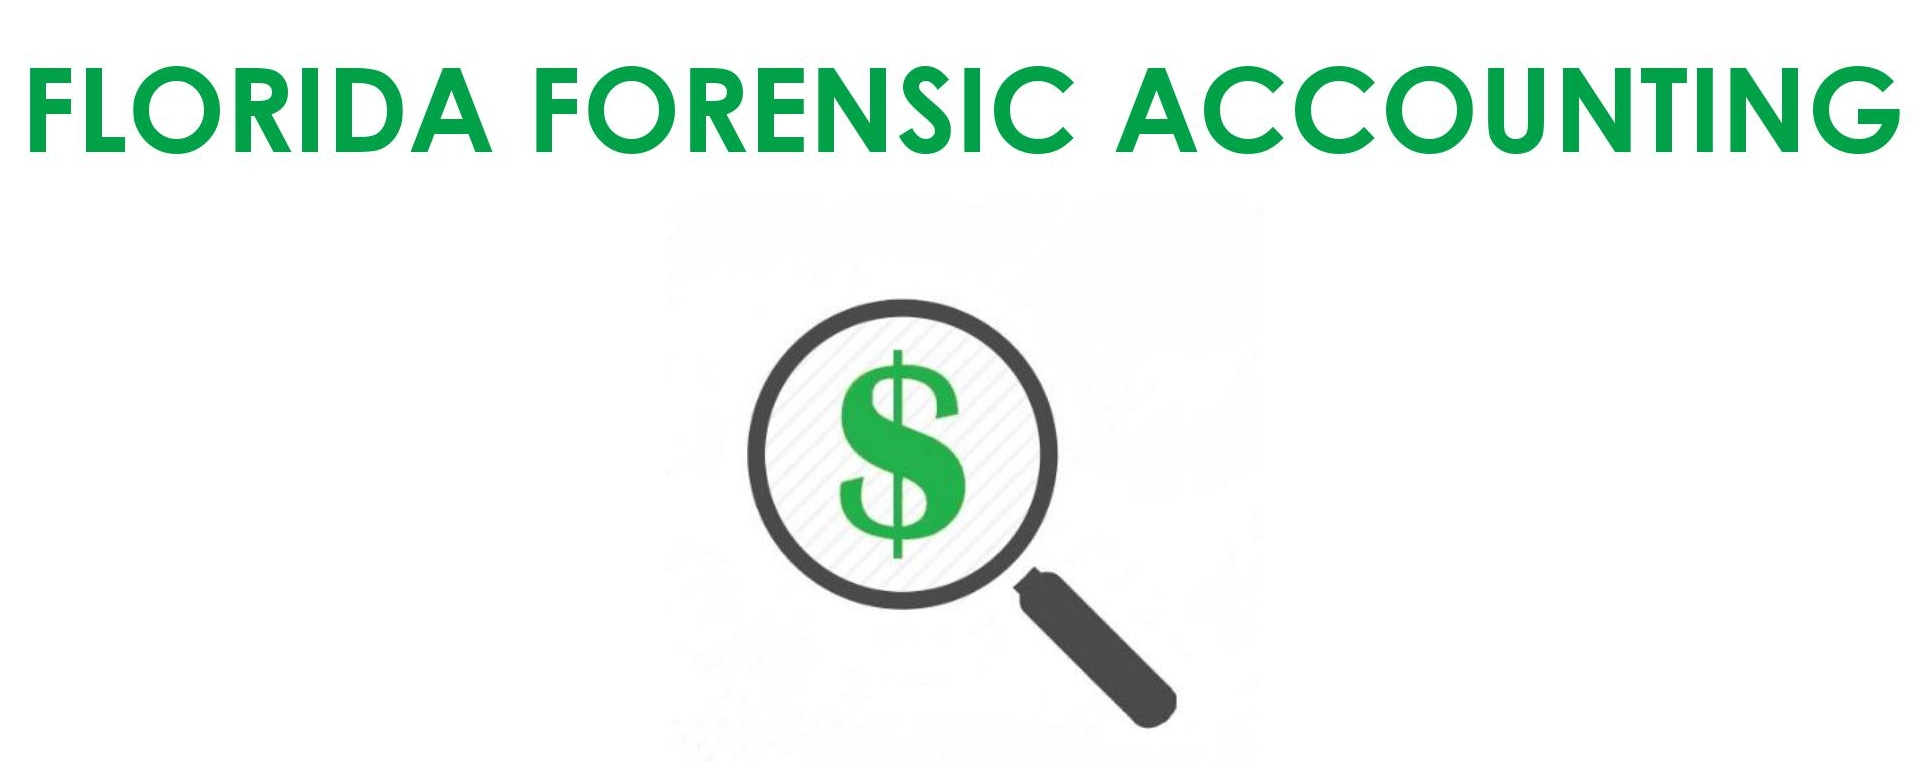 florida forensic accounting